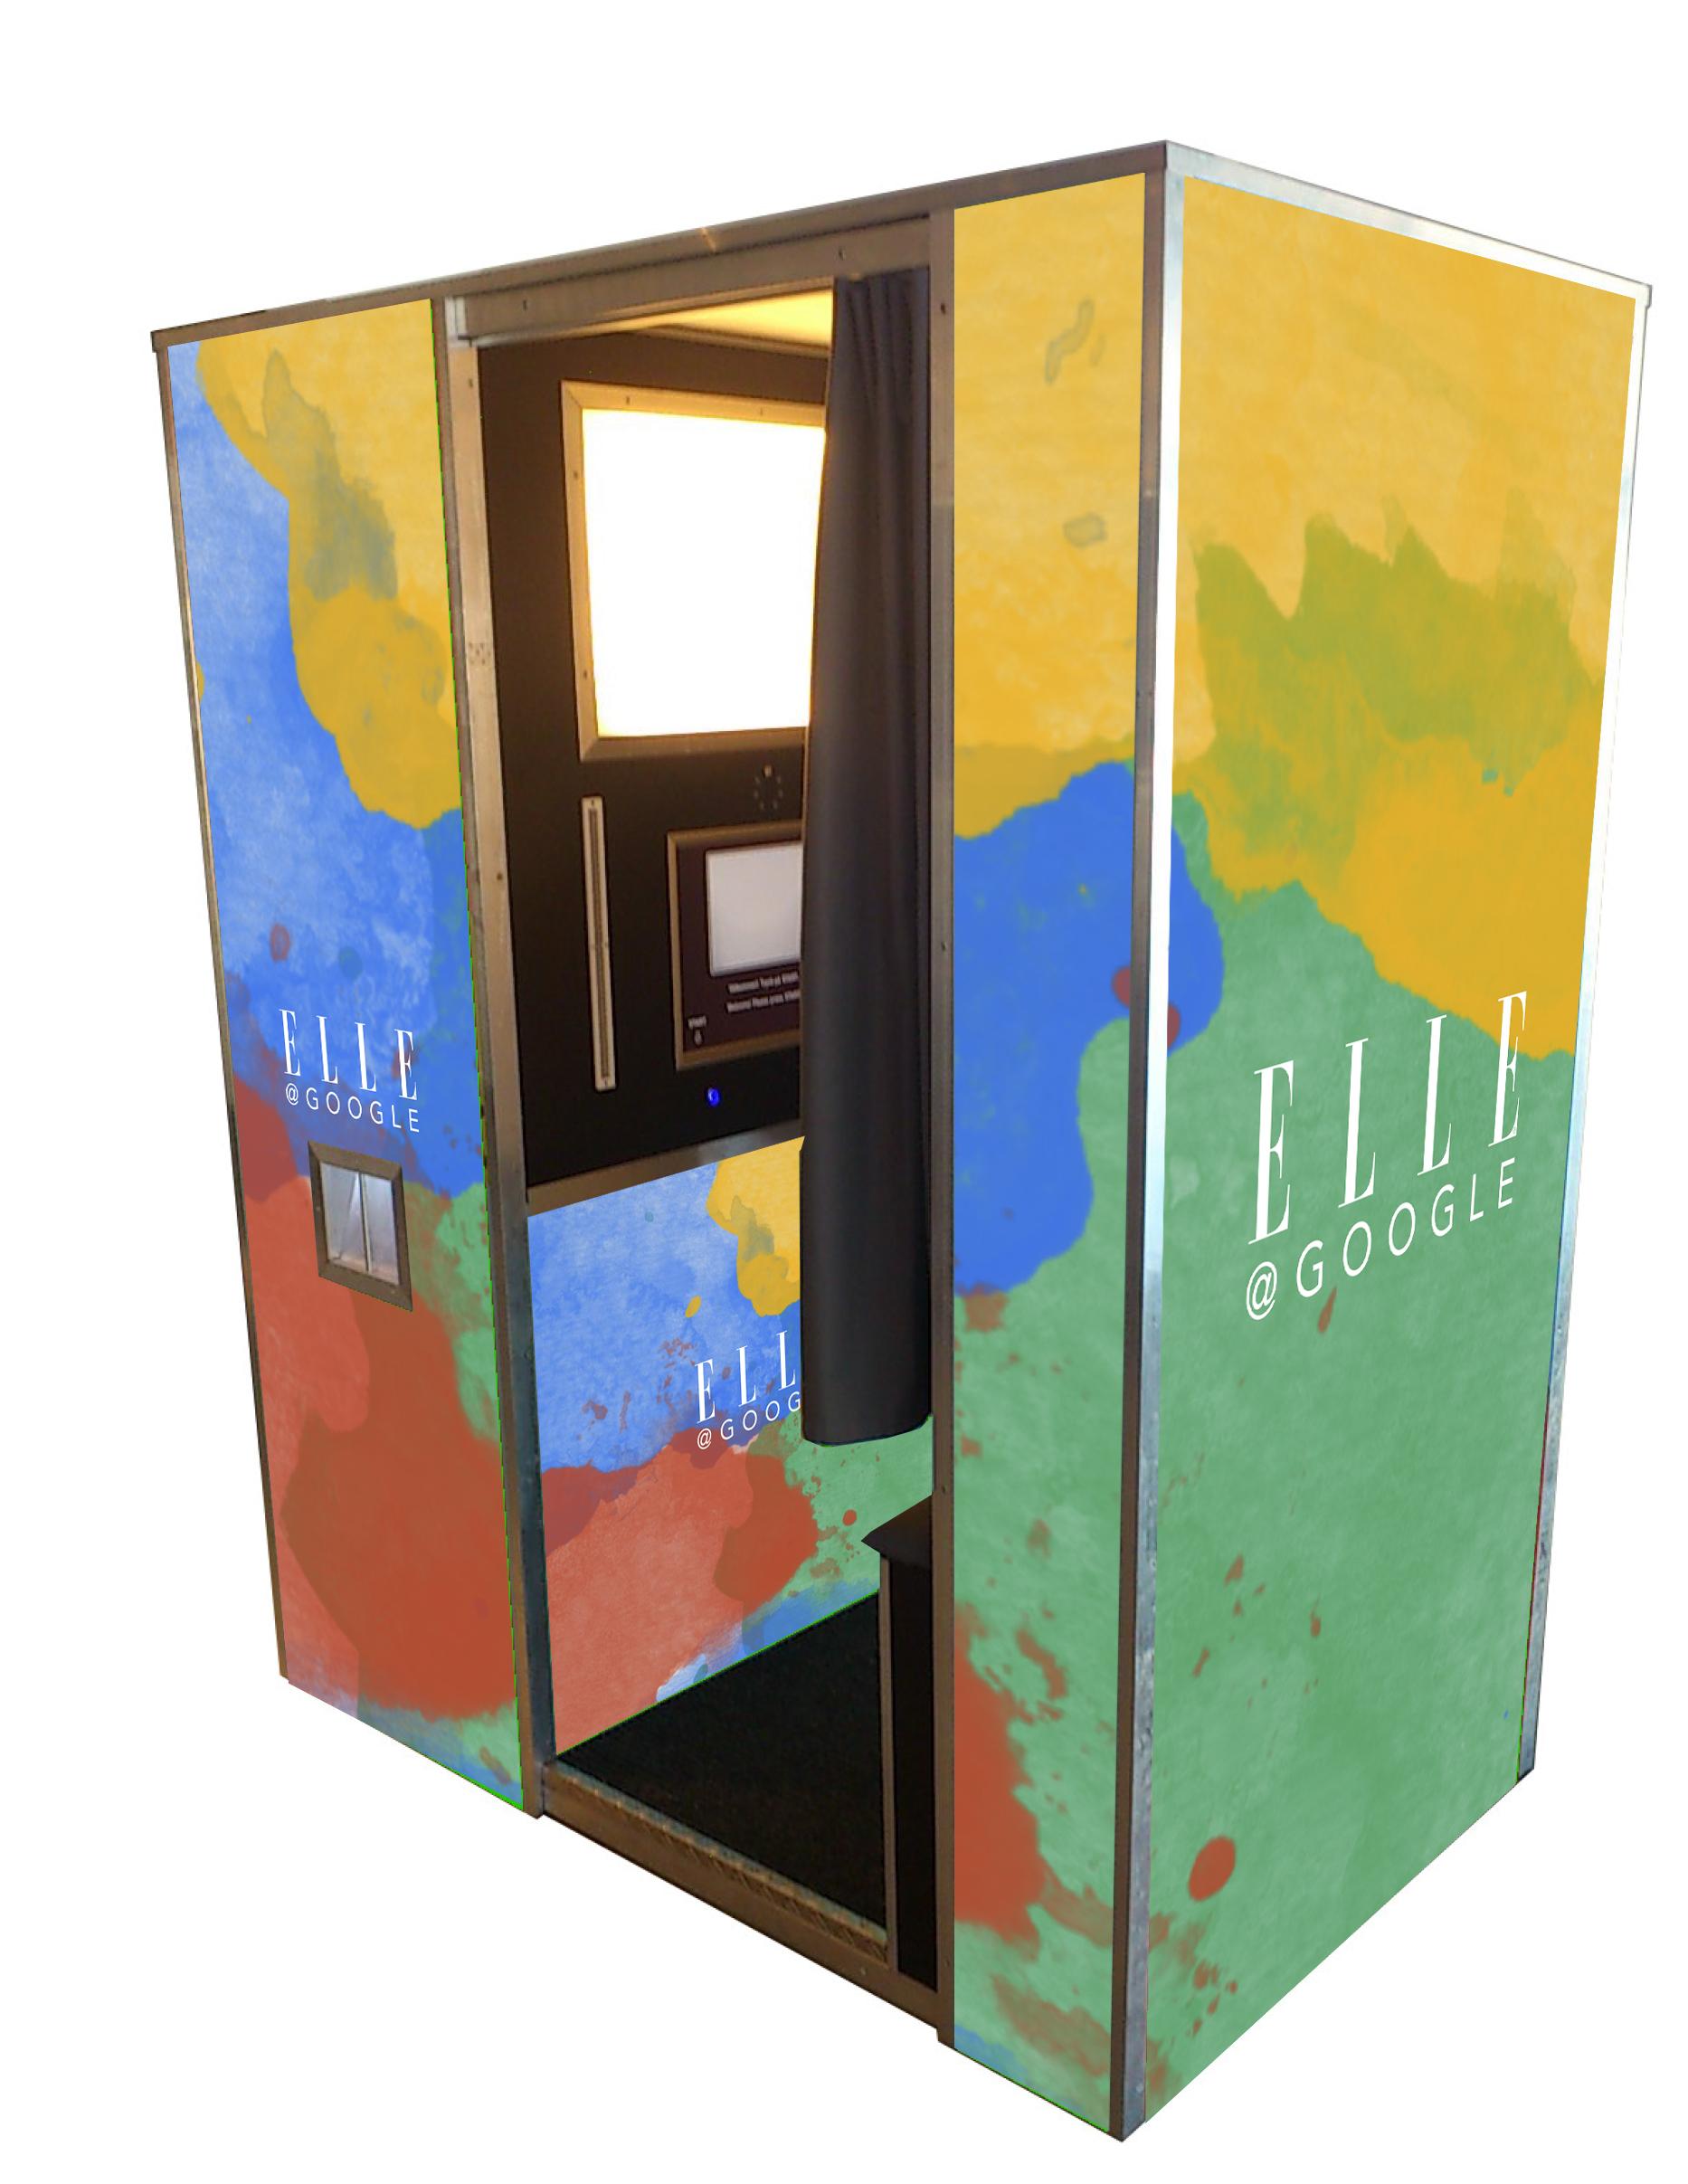 Production of photobooth Google/Elle